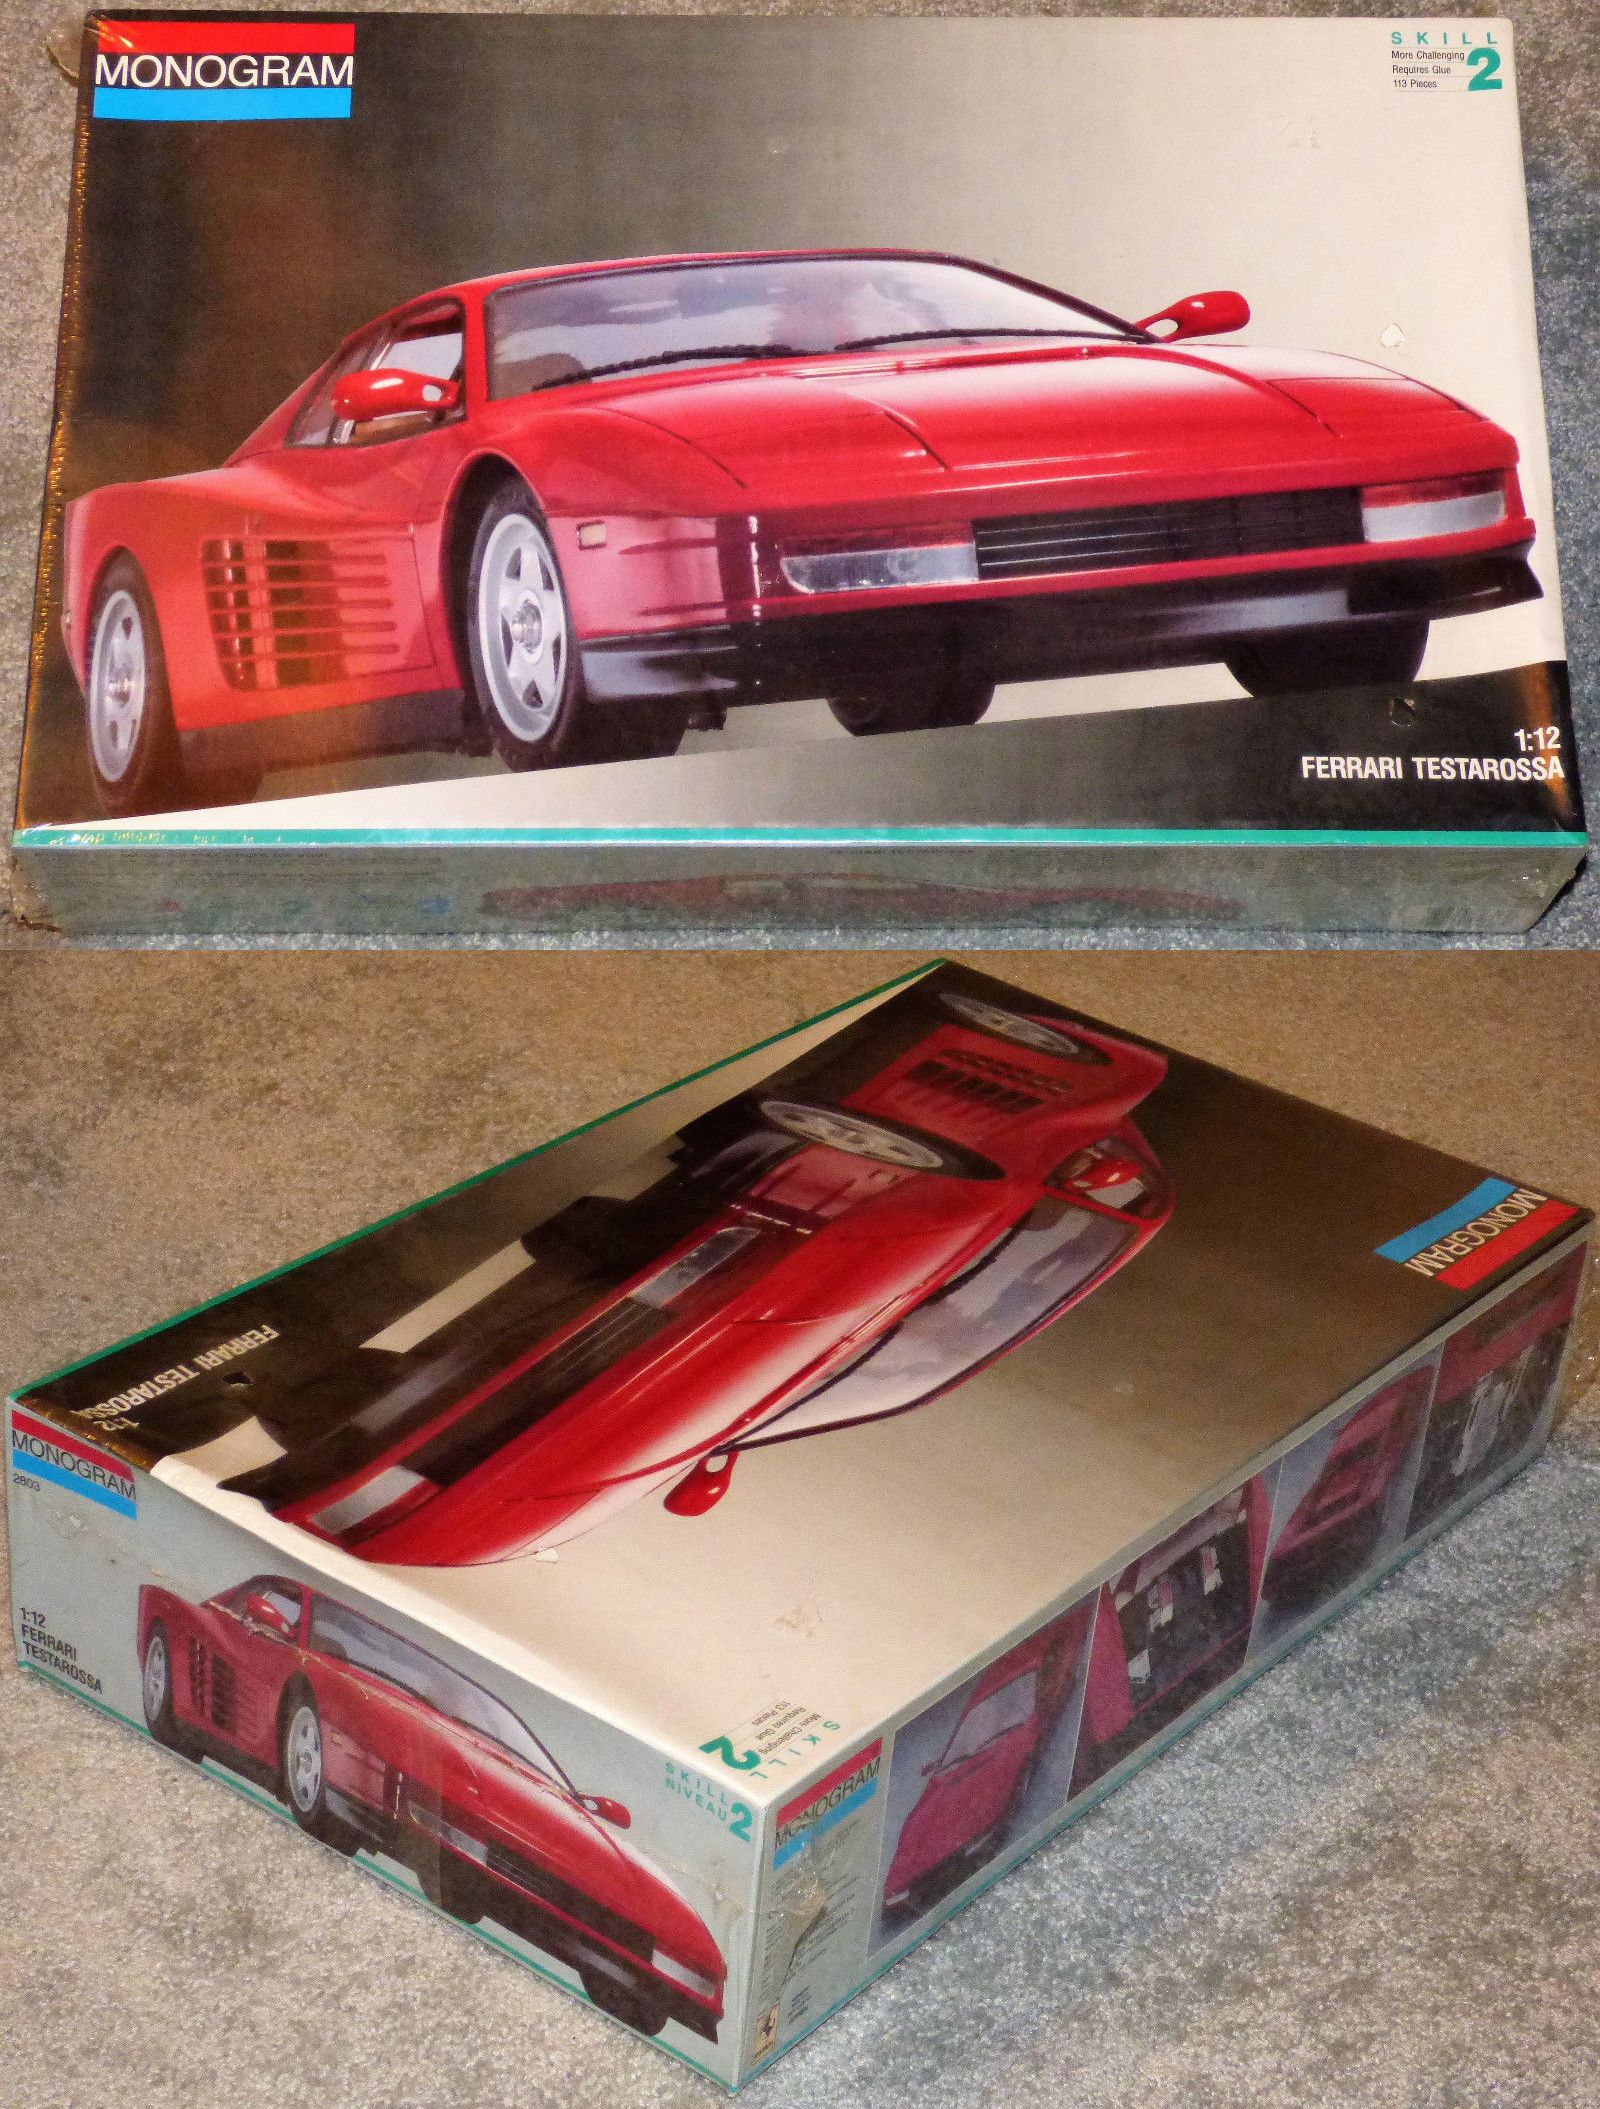 1 12 Scale 145972 Monogram Ferrari Testarossa 1 12 Scale Car Model Kit 2803 New Nib Buy It Now Only 89 9 Model Cars Kits Plastic Model Kits Tamiya Models